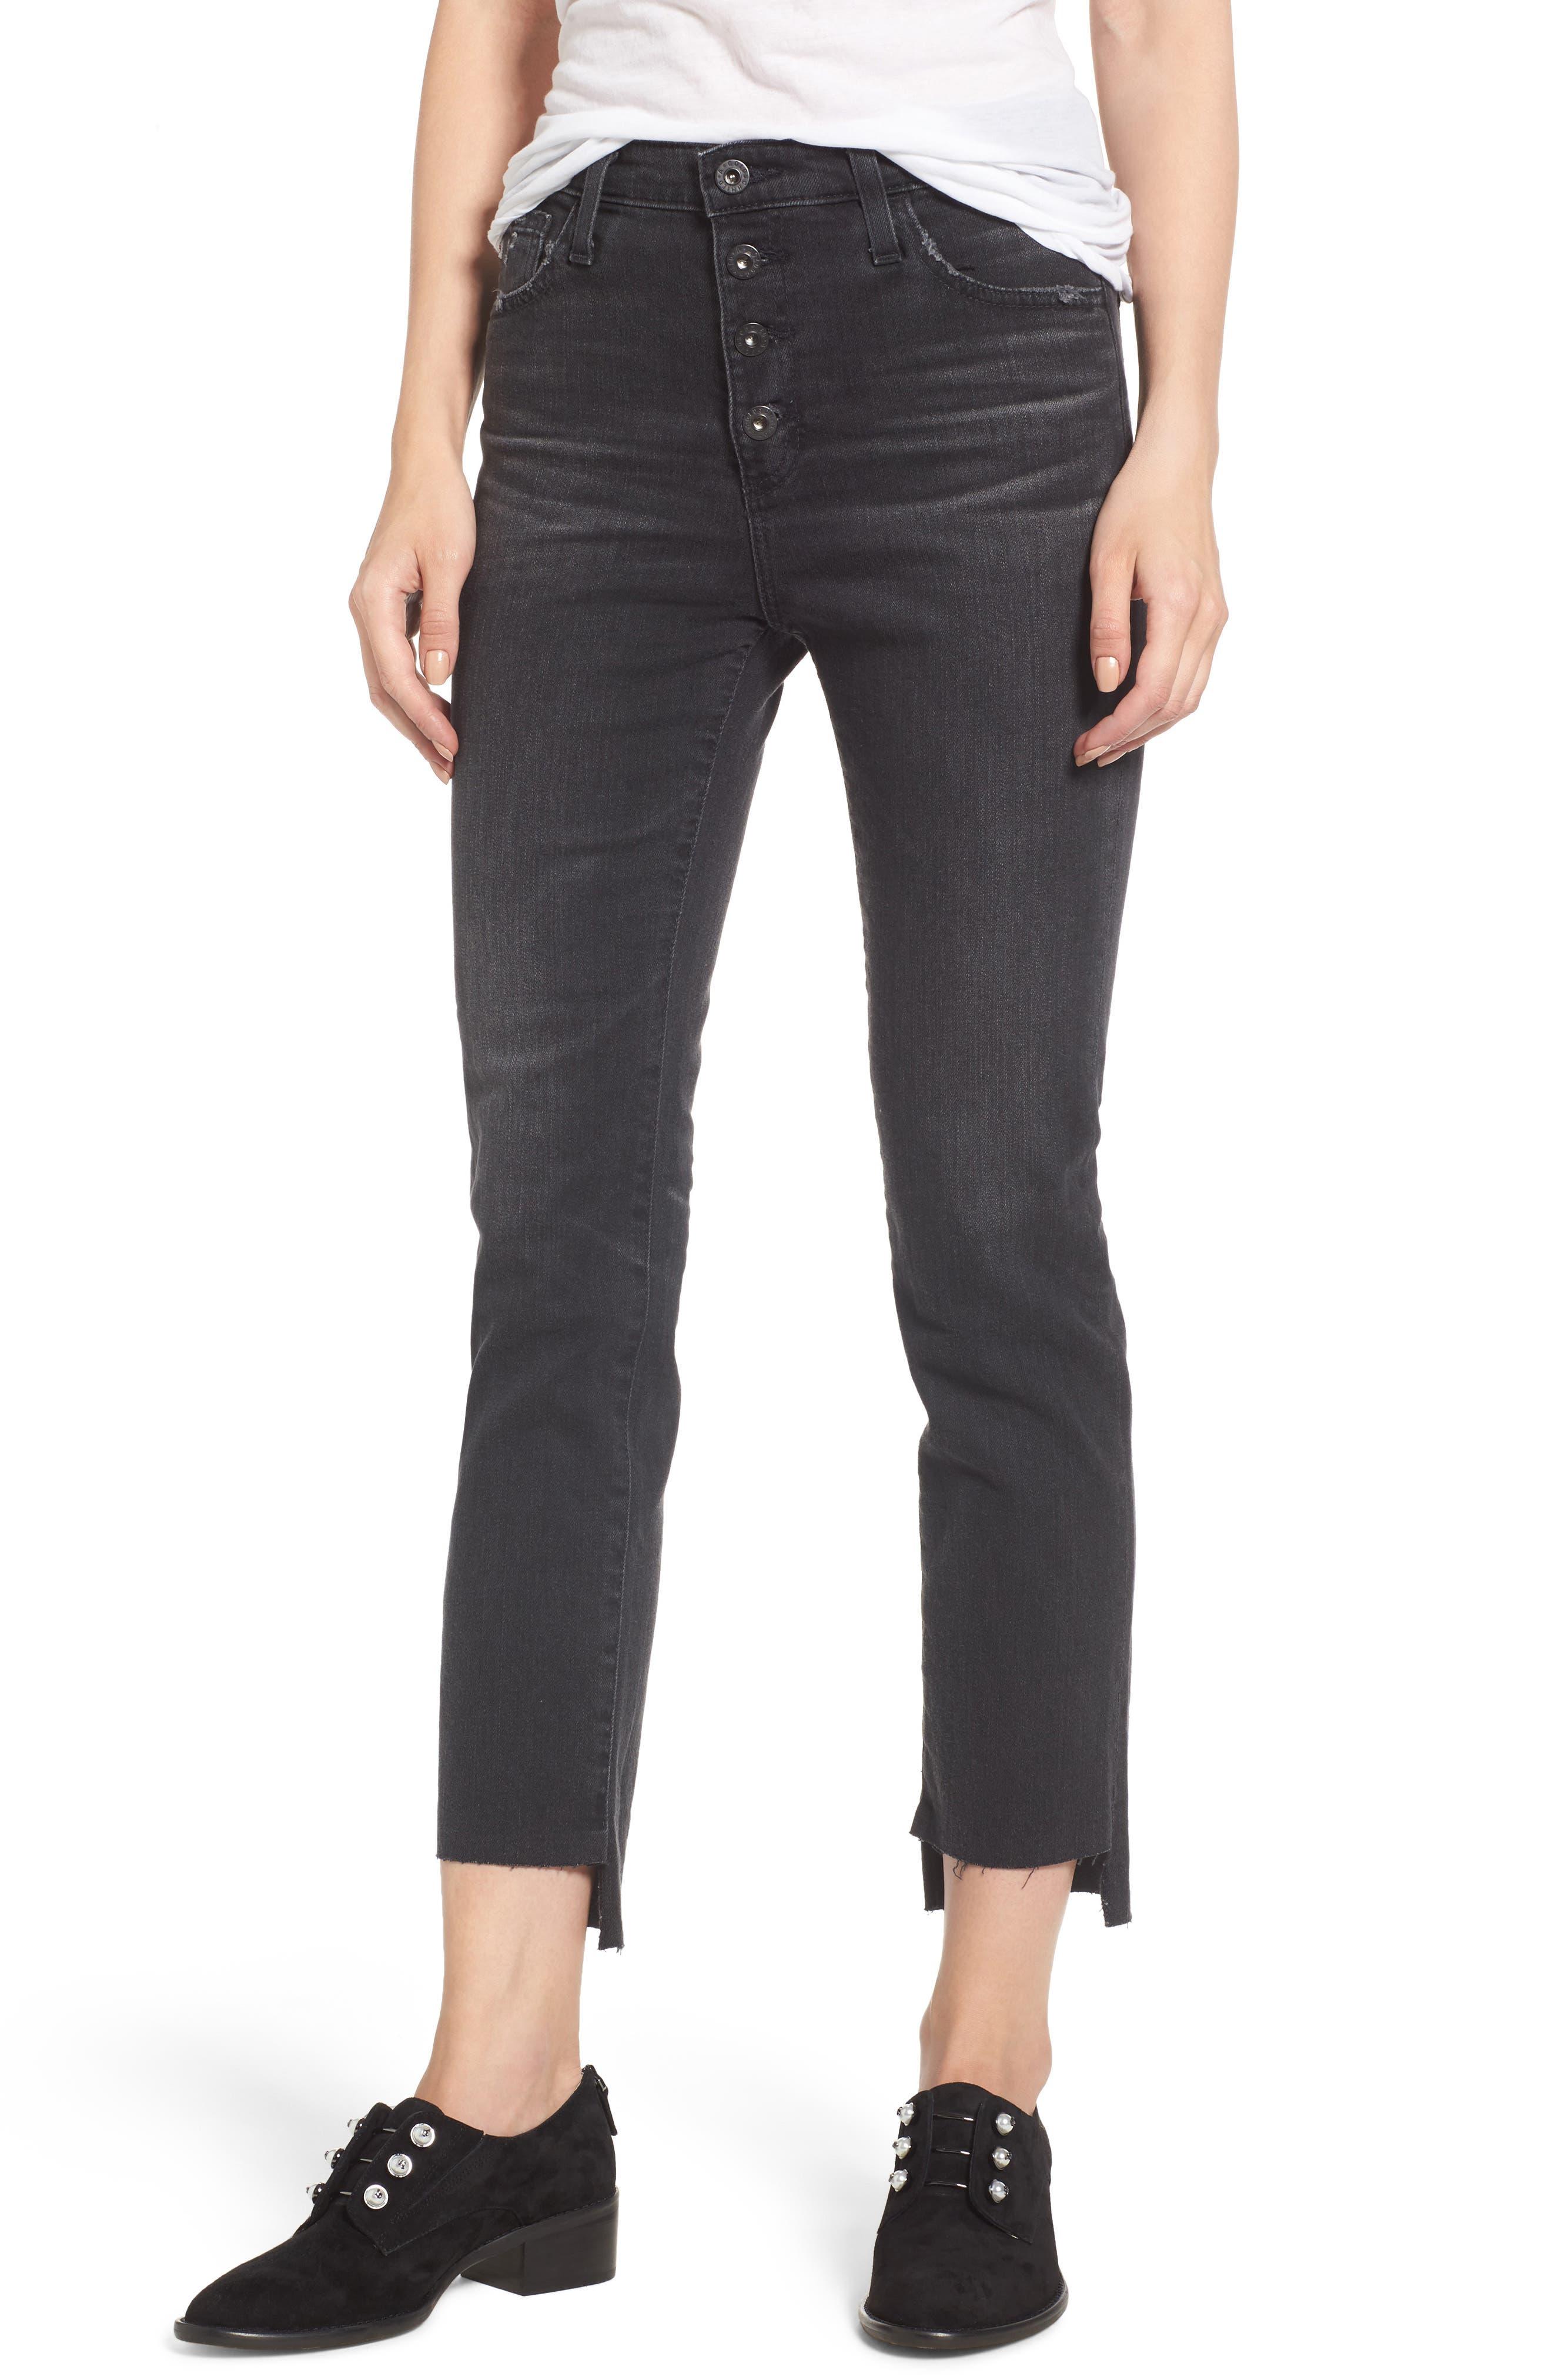 AG Isabelle High Waist Step Hem Jeans (10 Years Generation)